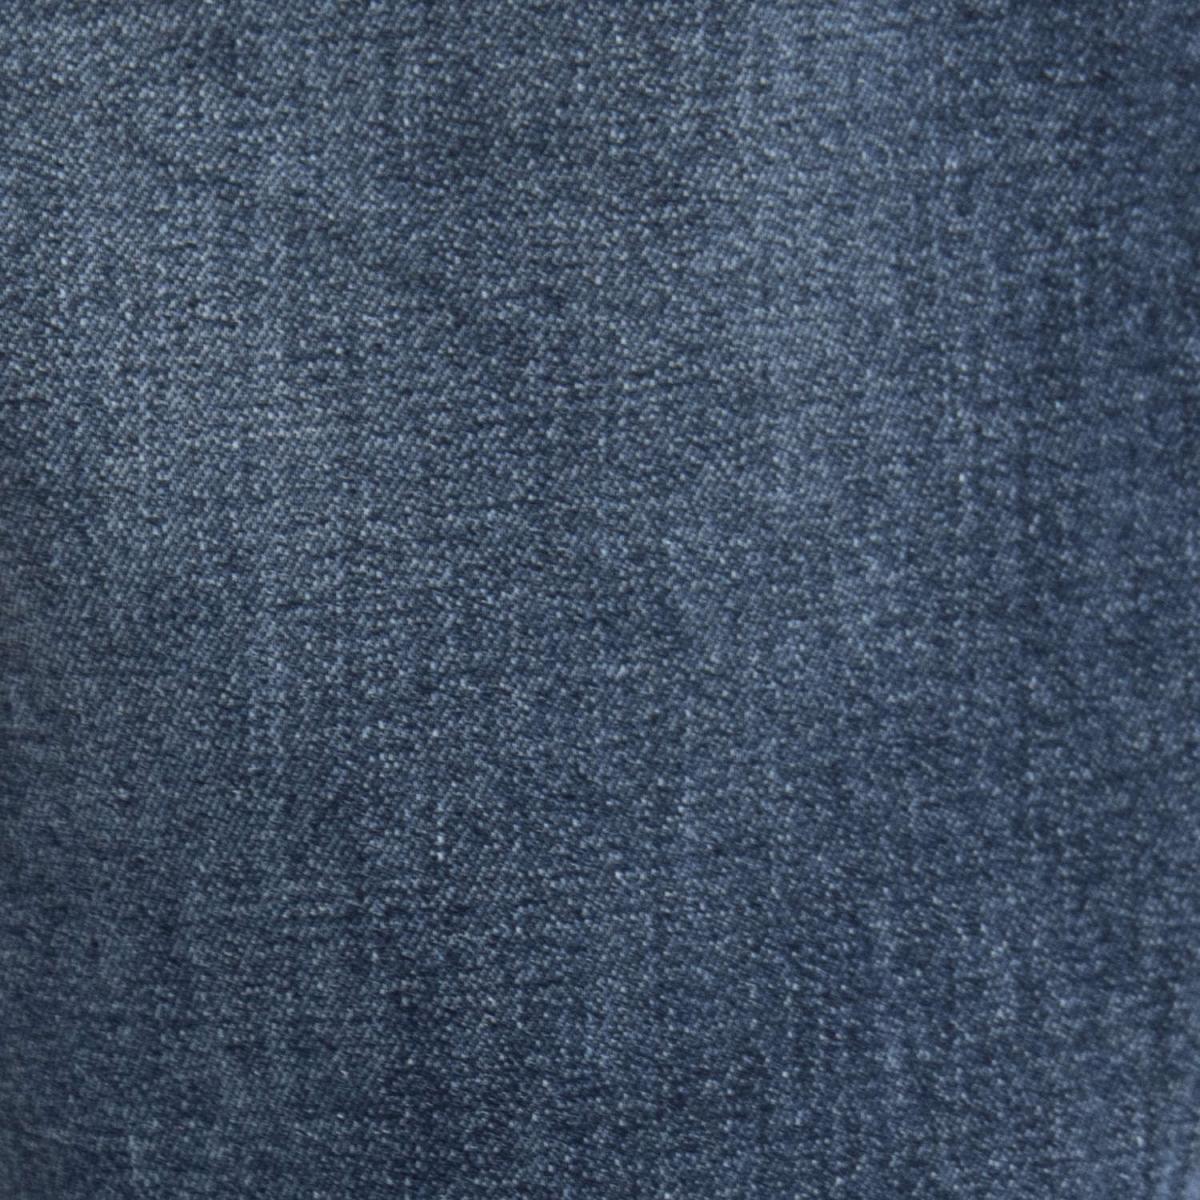 abbigliamento Jeans uomo Jeans slim fit ATM1088-4 LANDEK PARK Cafedelmar Shop